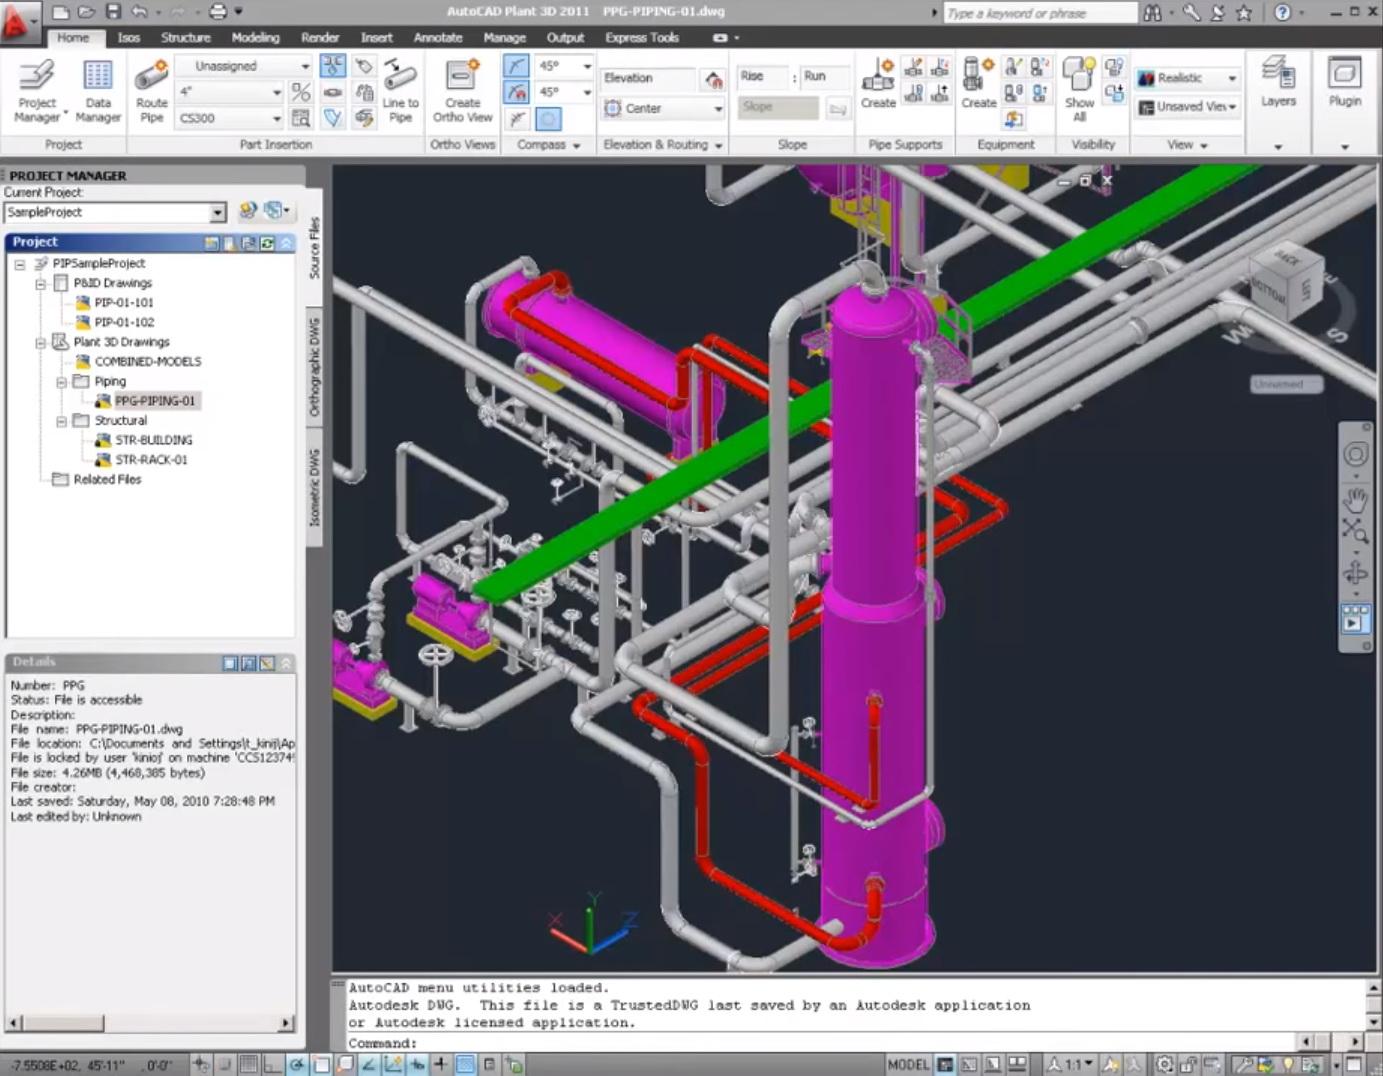 Synergysoft : ซินเนอร์จี้ซอฟต์ - AutoCAD Plant 3D